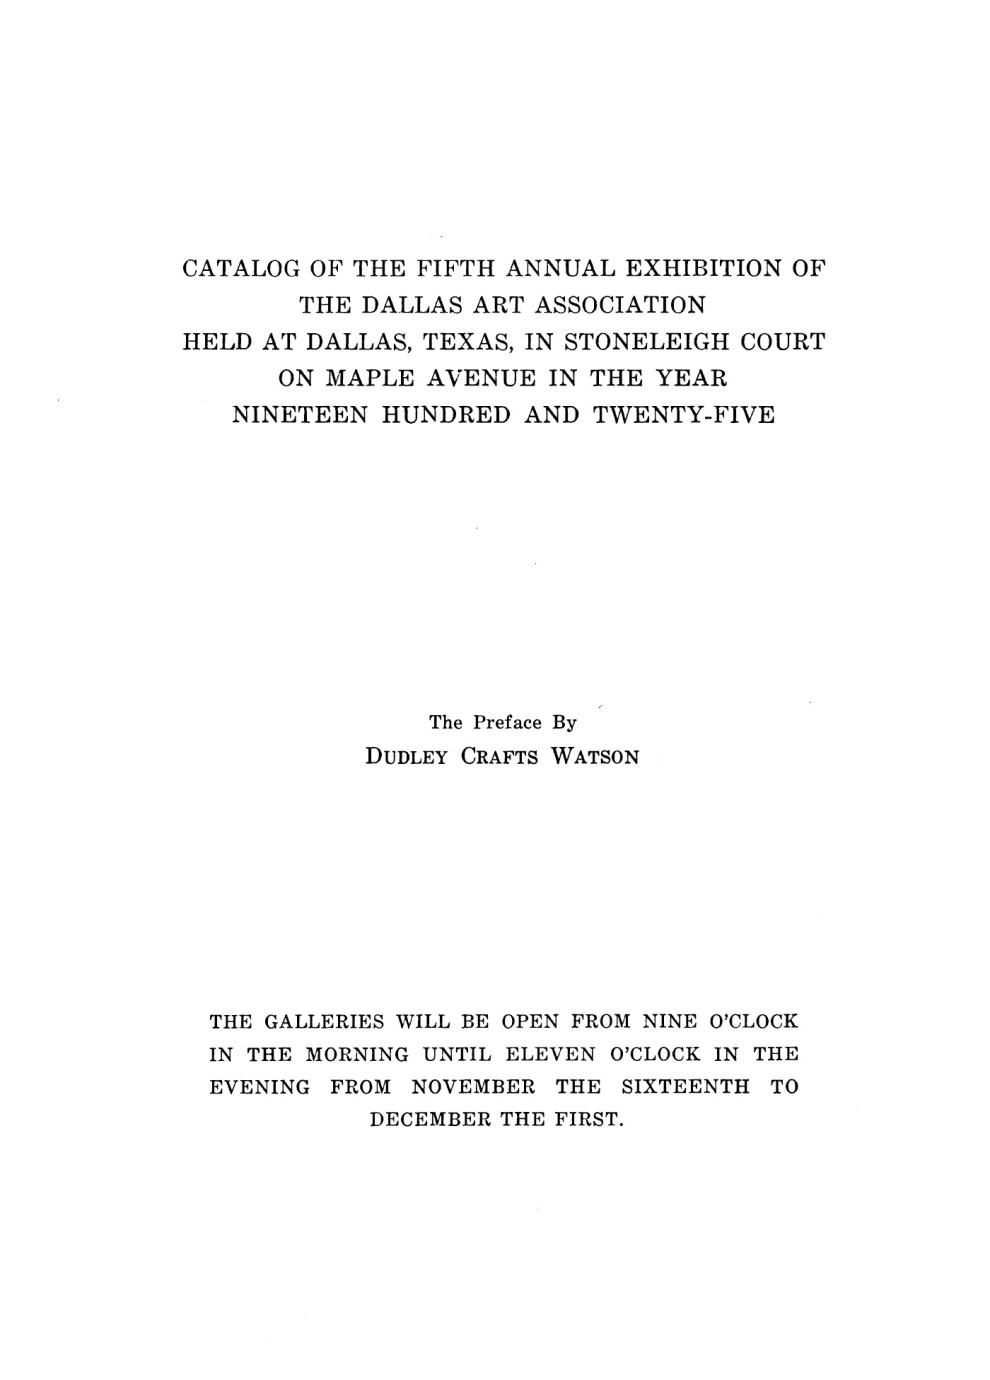 "The Dallas Art Association, Stoneleigh Court, Dallas, TX, ""Fifth Annual Exhibition of The Dallas Art Association"", November 16 – December 1, 1925"